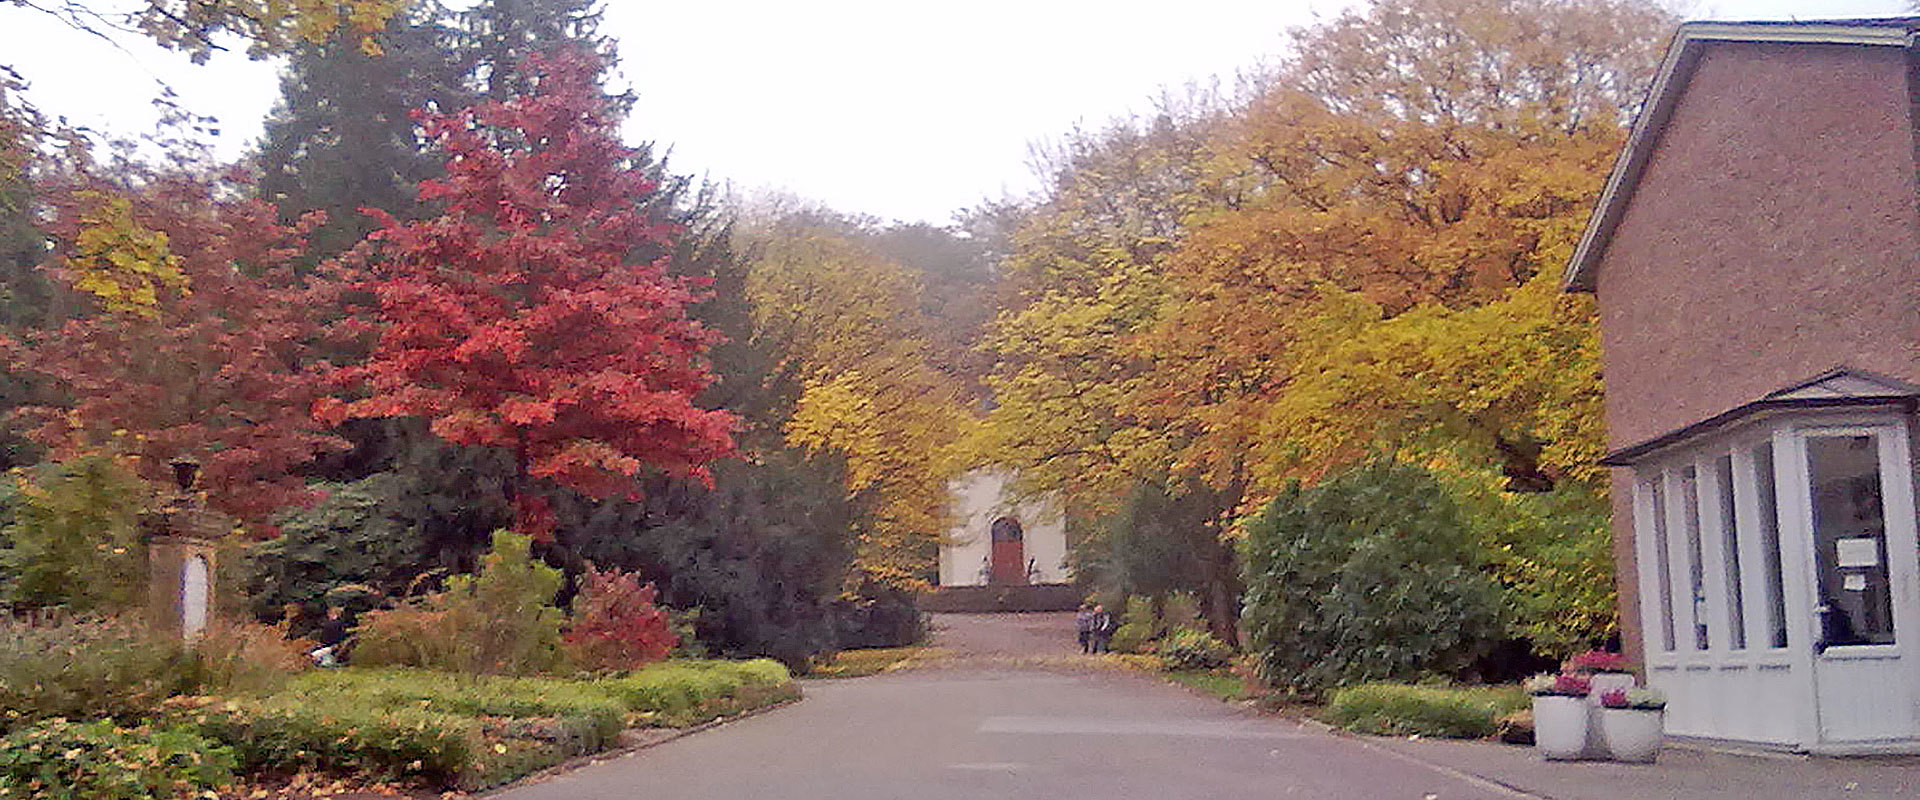 Friedhofsgärtnerei Haas